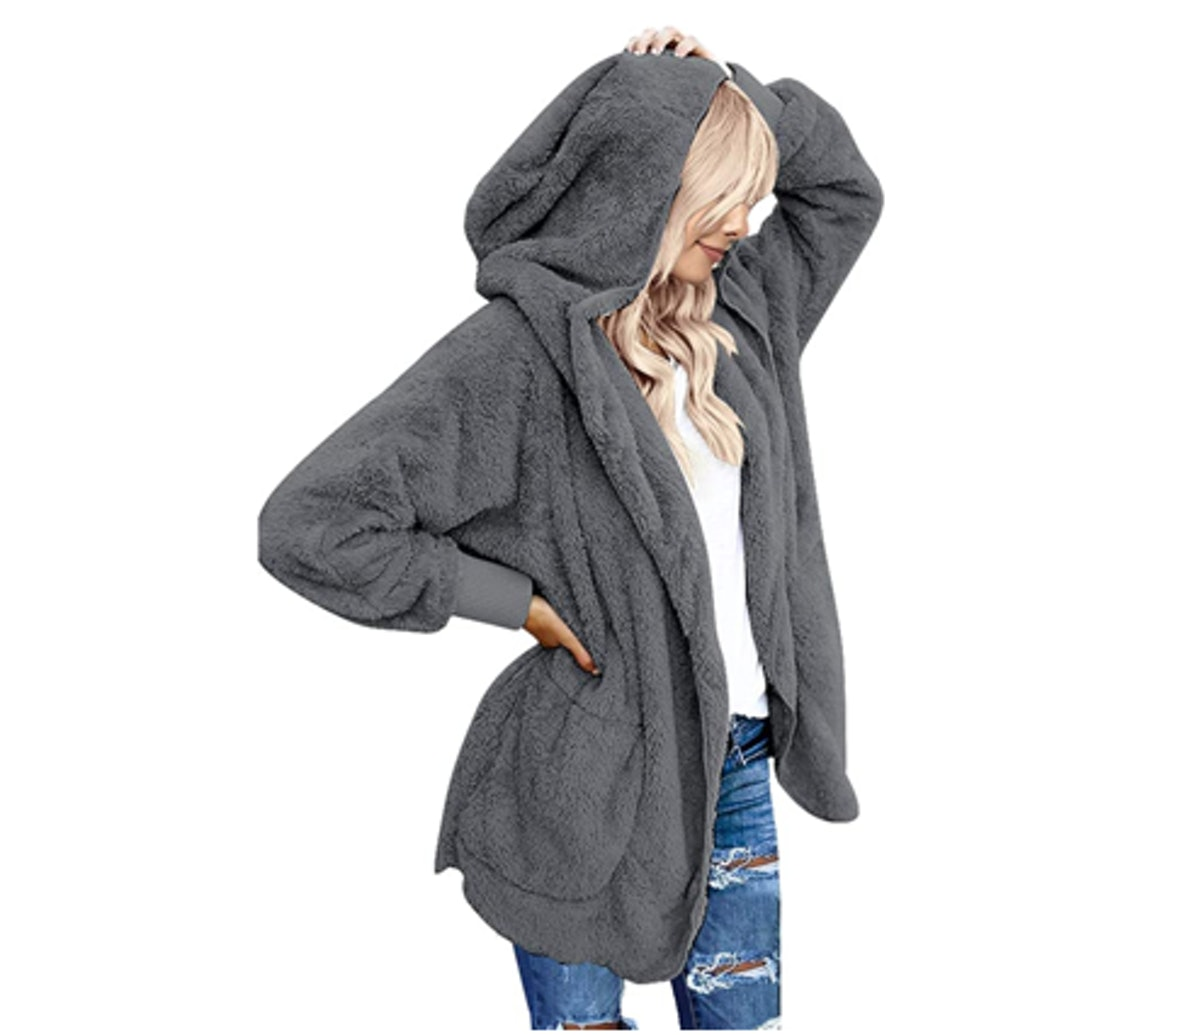 LookbookStore Fuzzy Hooded Cardigan